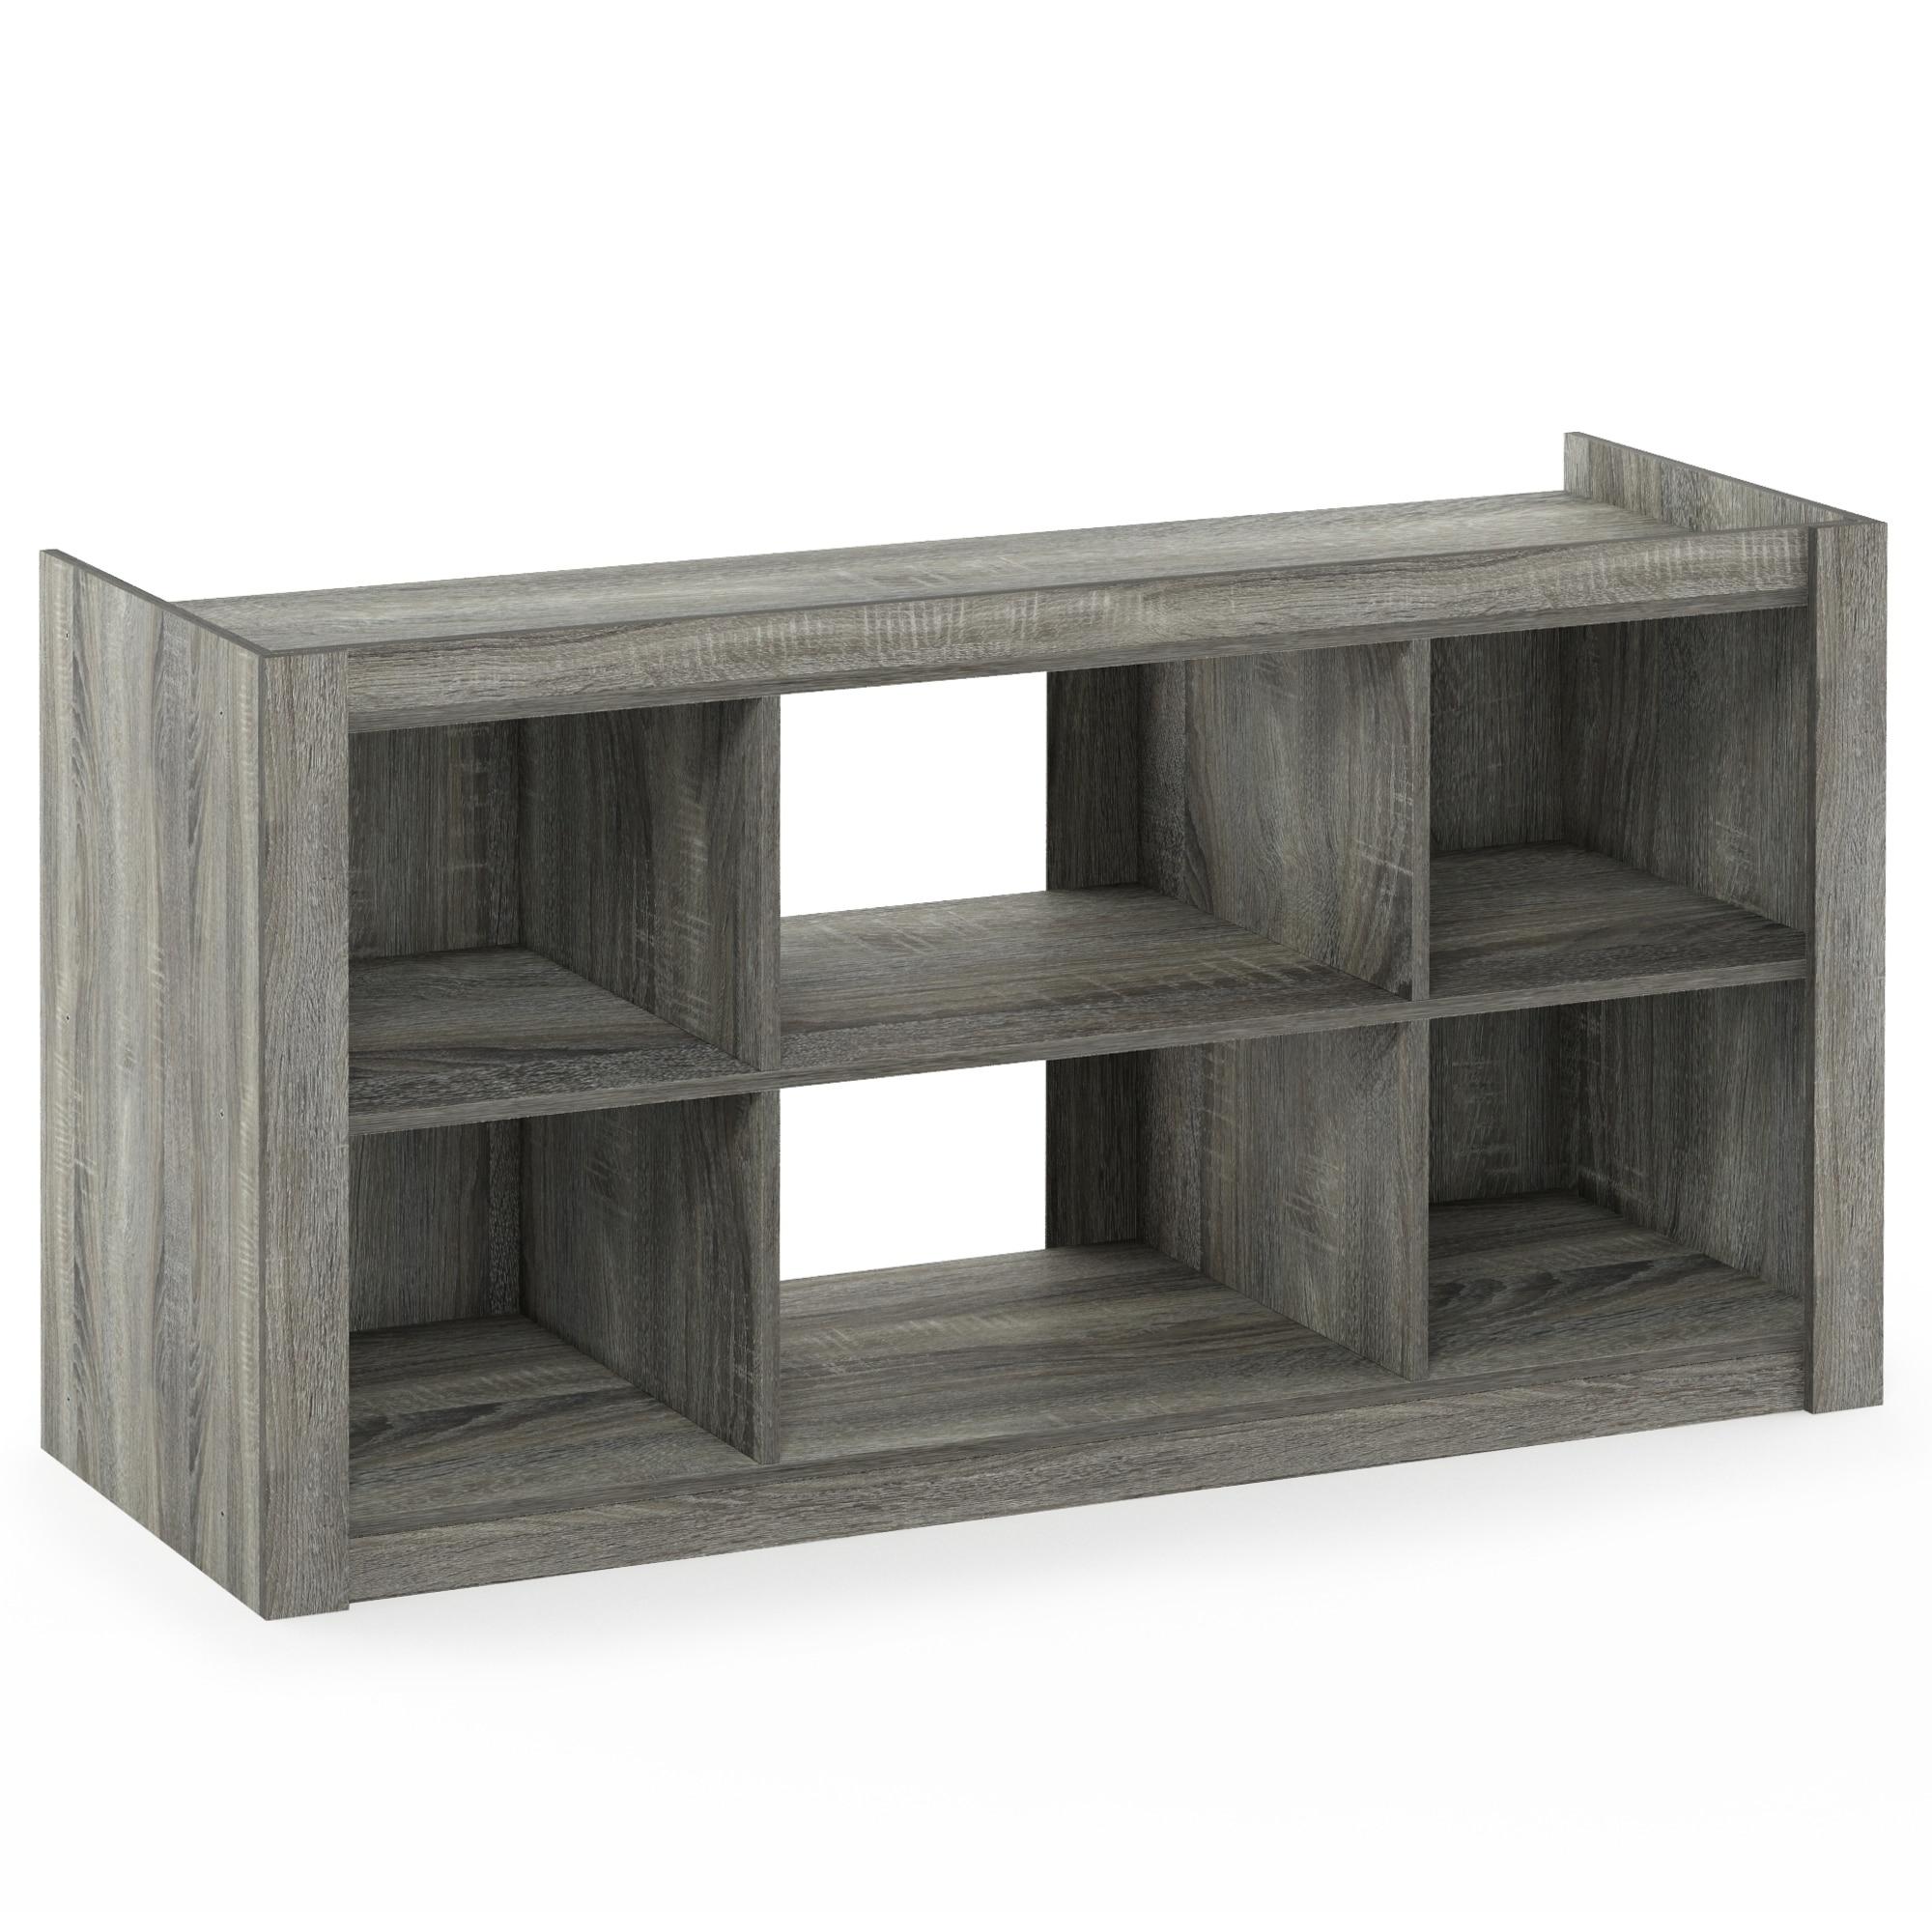 Furinno Fowler Multipurpose Tv Stand Bookshelves French Oak Grey